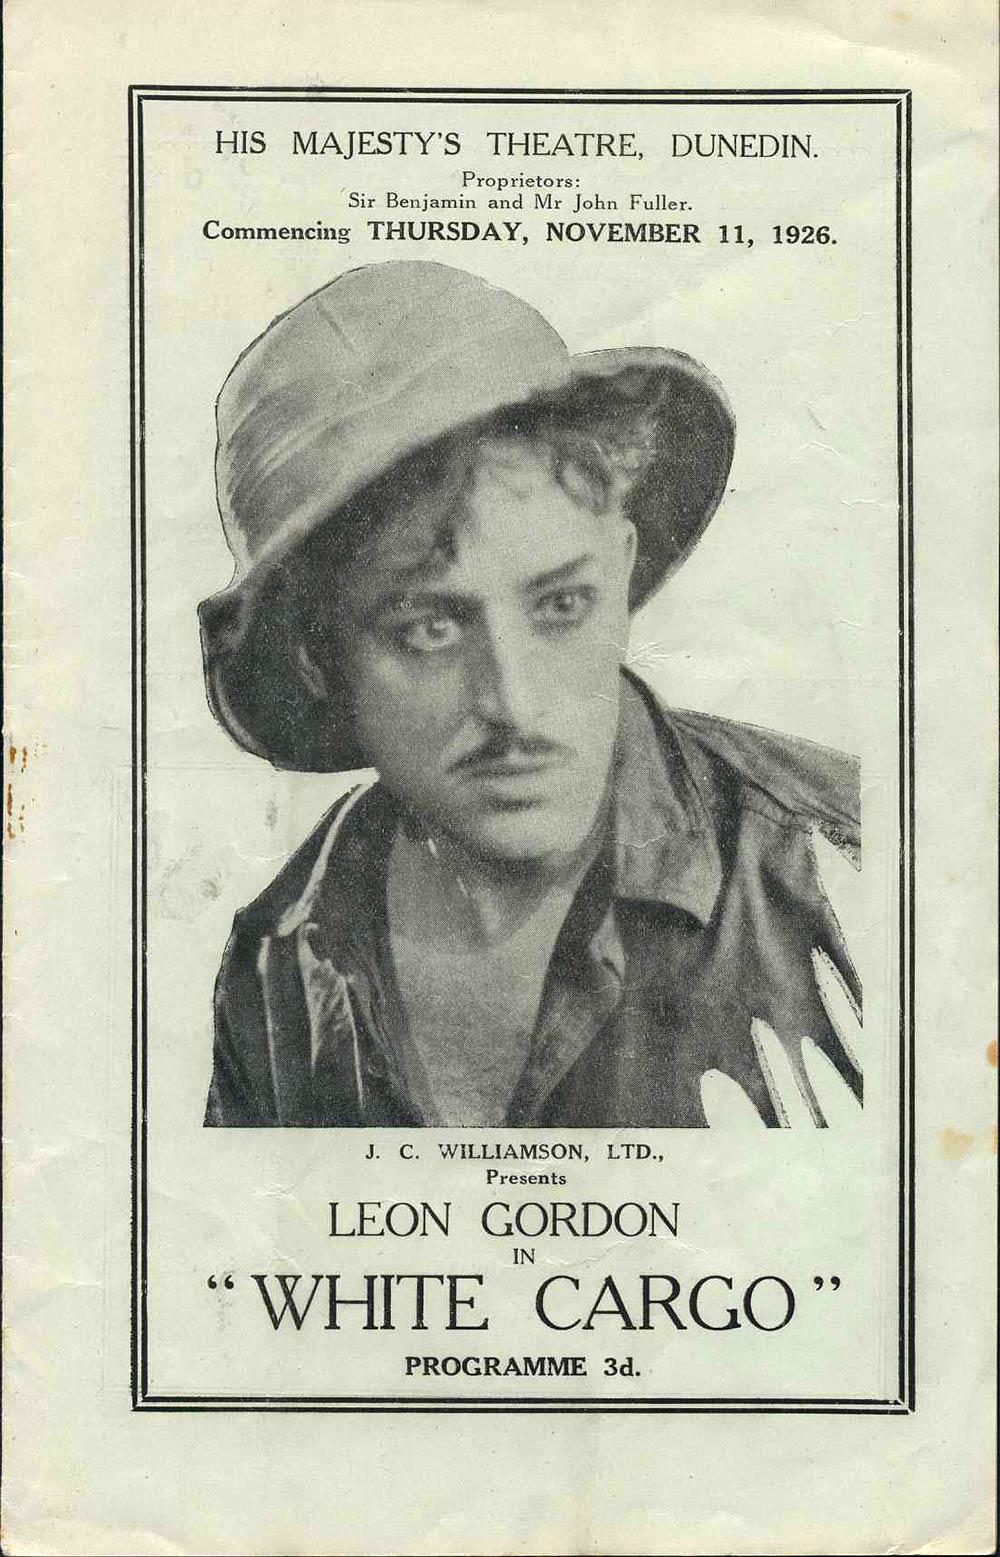 <em>White cargo</em>. Leon Gordon. (J.C. Williamson Ltd.). His Majesty's Theatre, Dunedin, Nov. 11, 1926.